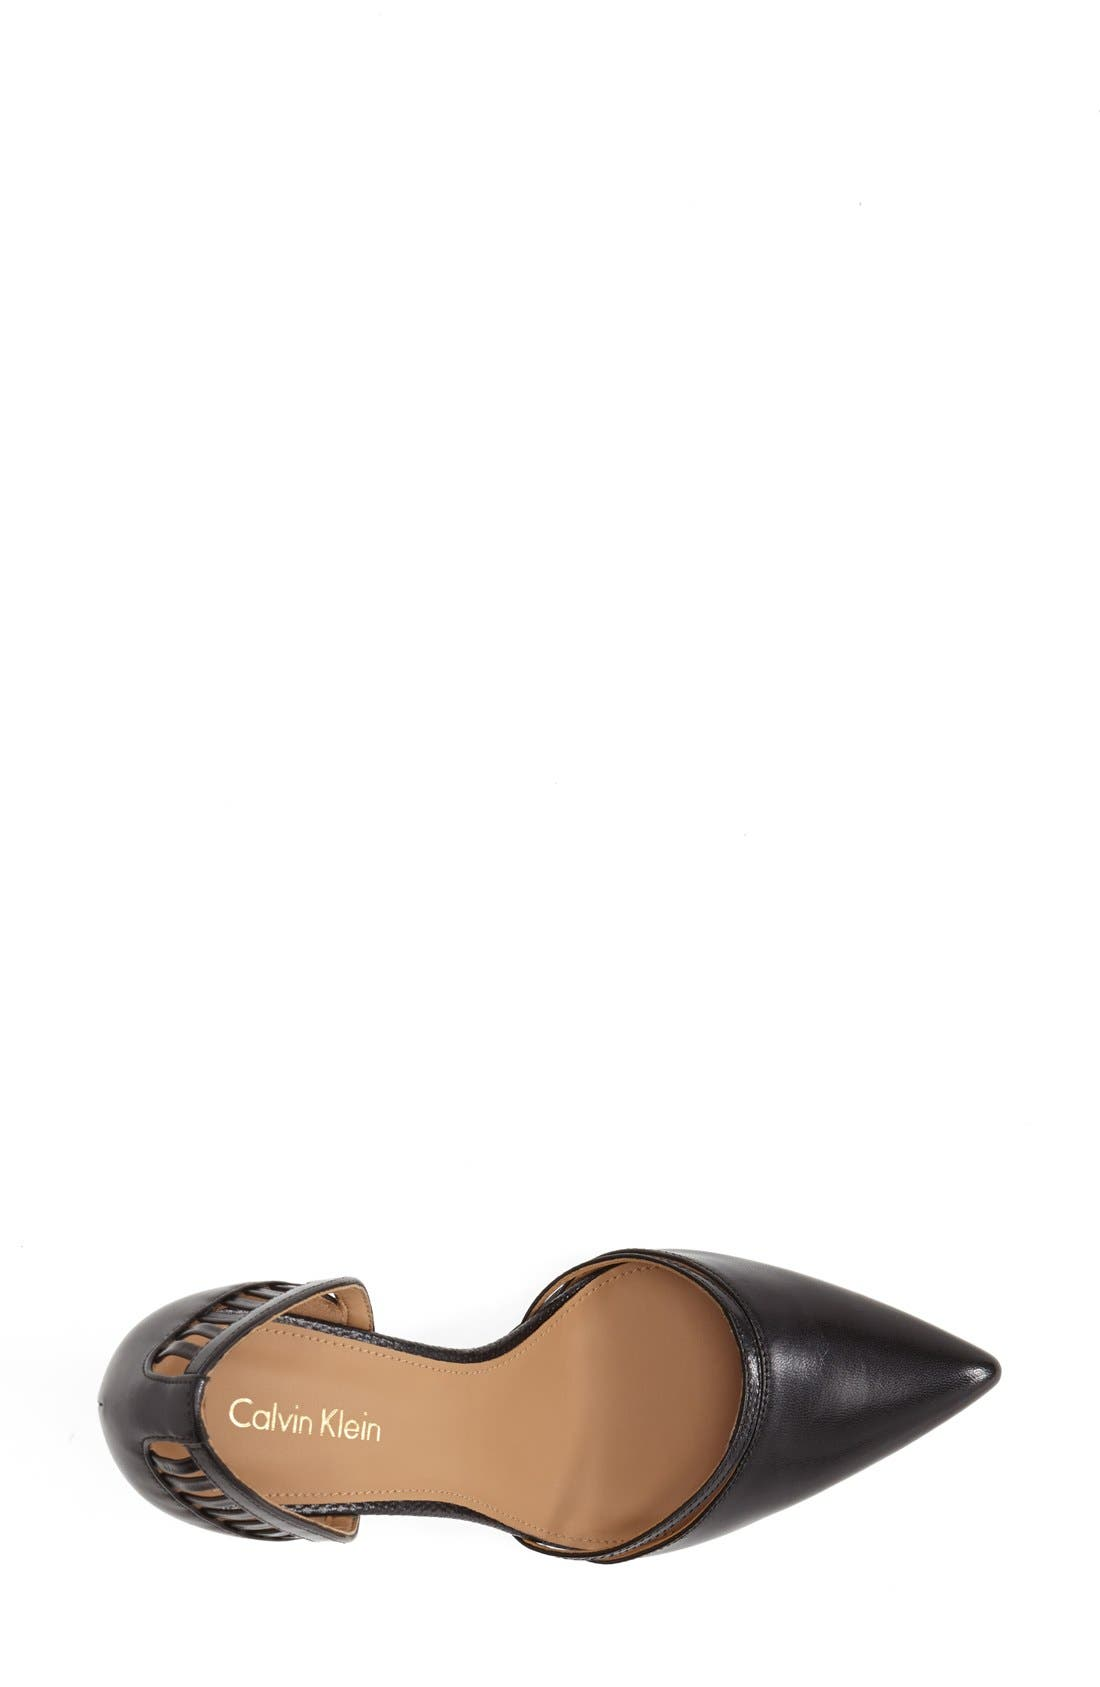 CALVIN KLEIN, 'Gilia' Cutout Leather d'Orsay Pump, Alternate thumbnail 4, color, 001